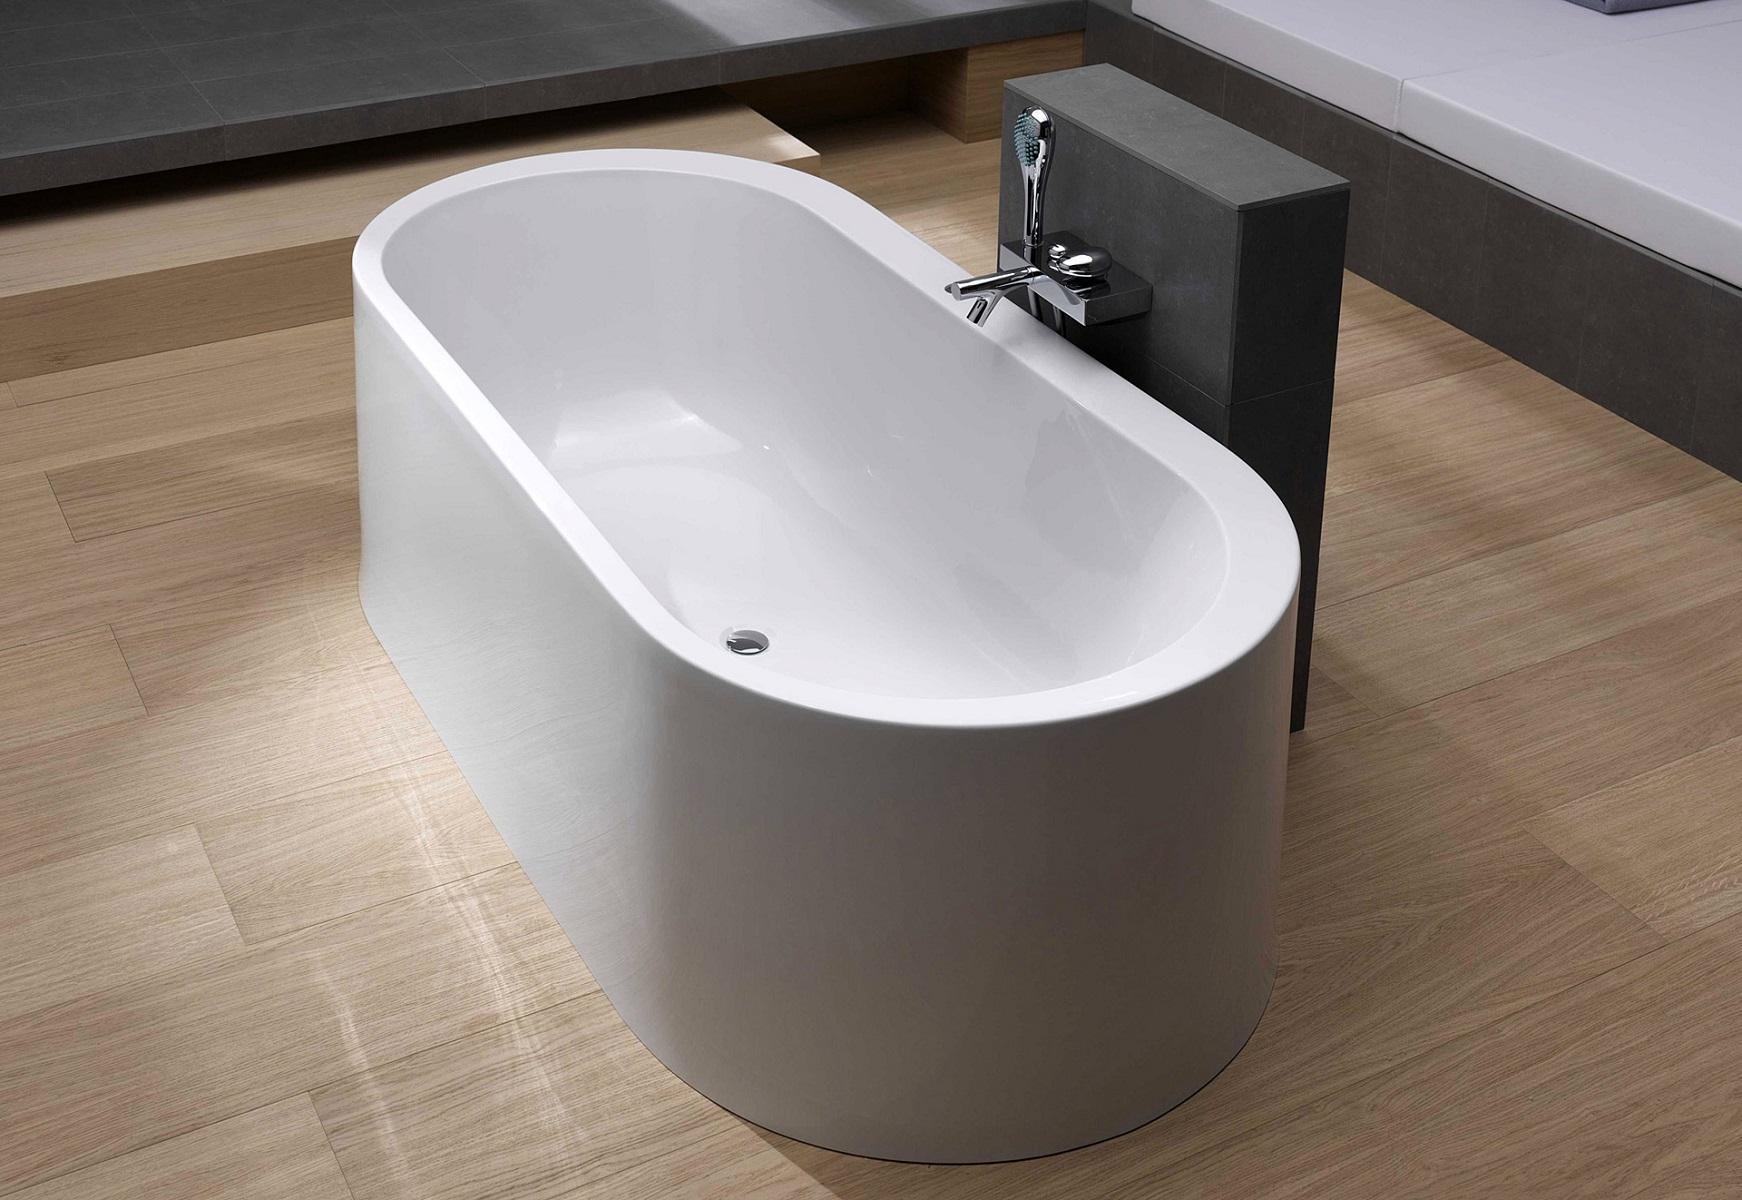 freestanding tub for two.  Aquatica PureScape 169 Freestanding Acrylic Bathtub